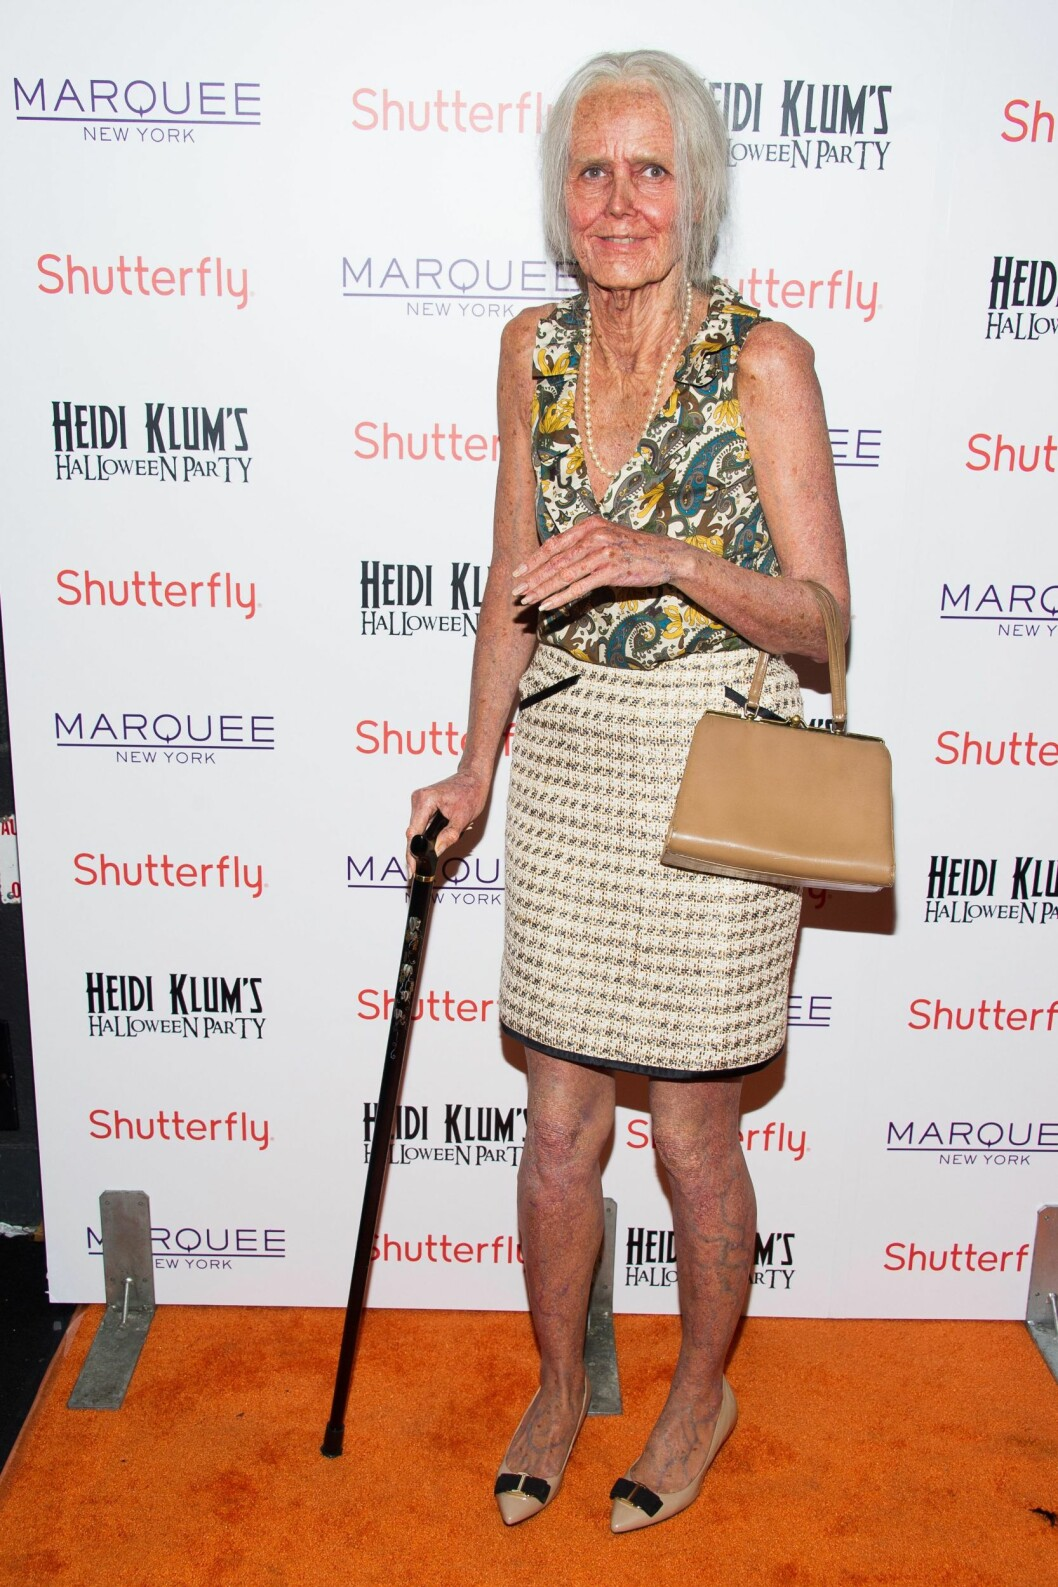 GAMMEL KLUM: I 2013 ble Heidi Klum omgjort til en gammel dame.  Foto: INVISION